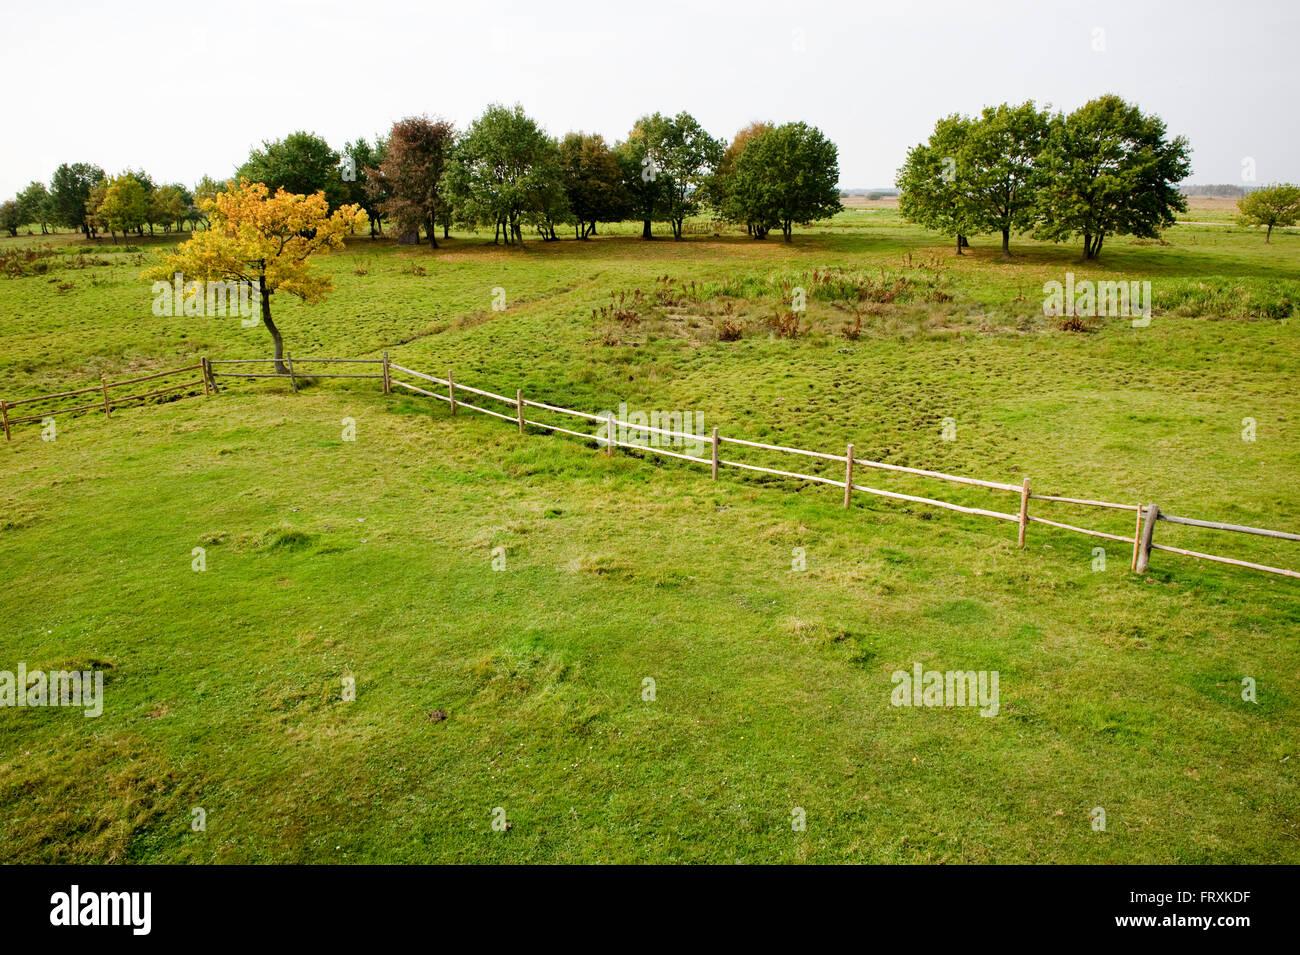 Pasture landscape, Biebrza National Park, Podlaskie Voivodeship, Poland - Stock Image